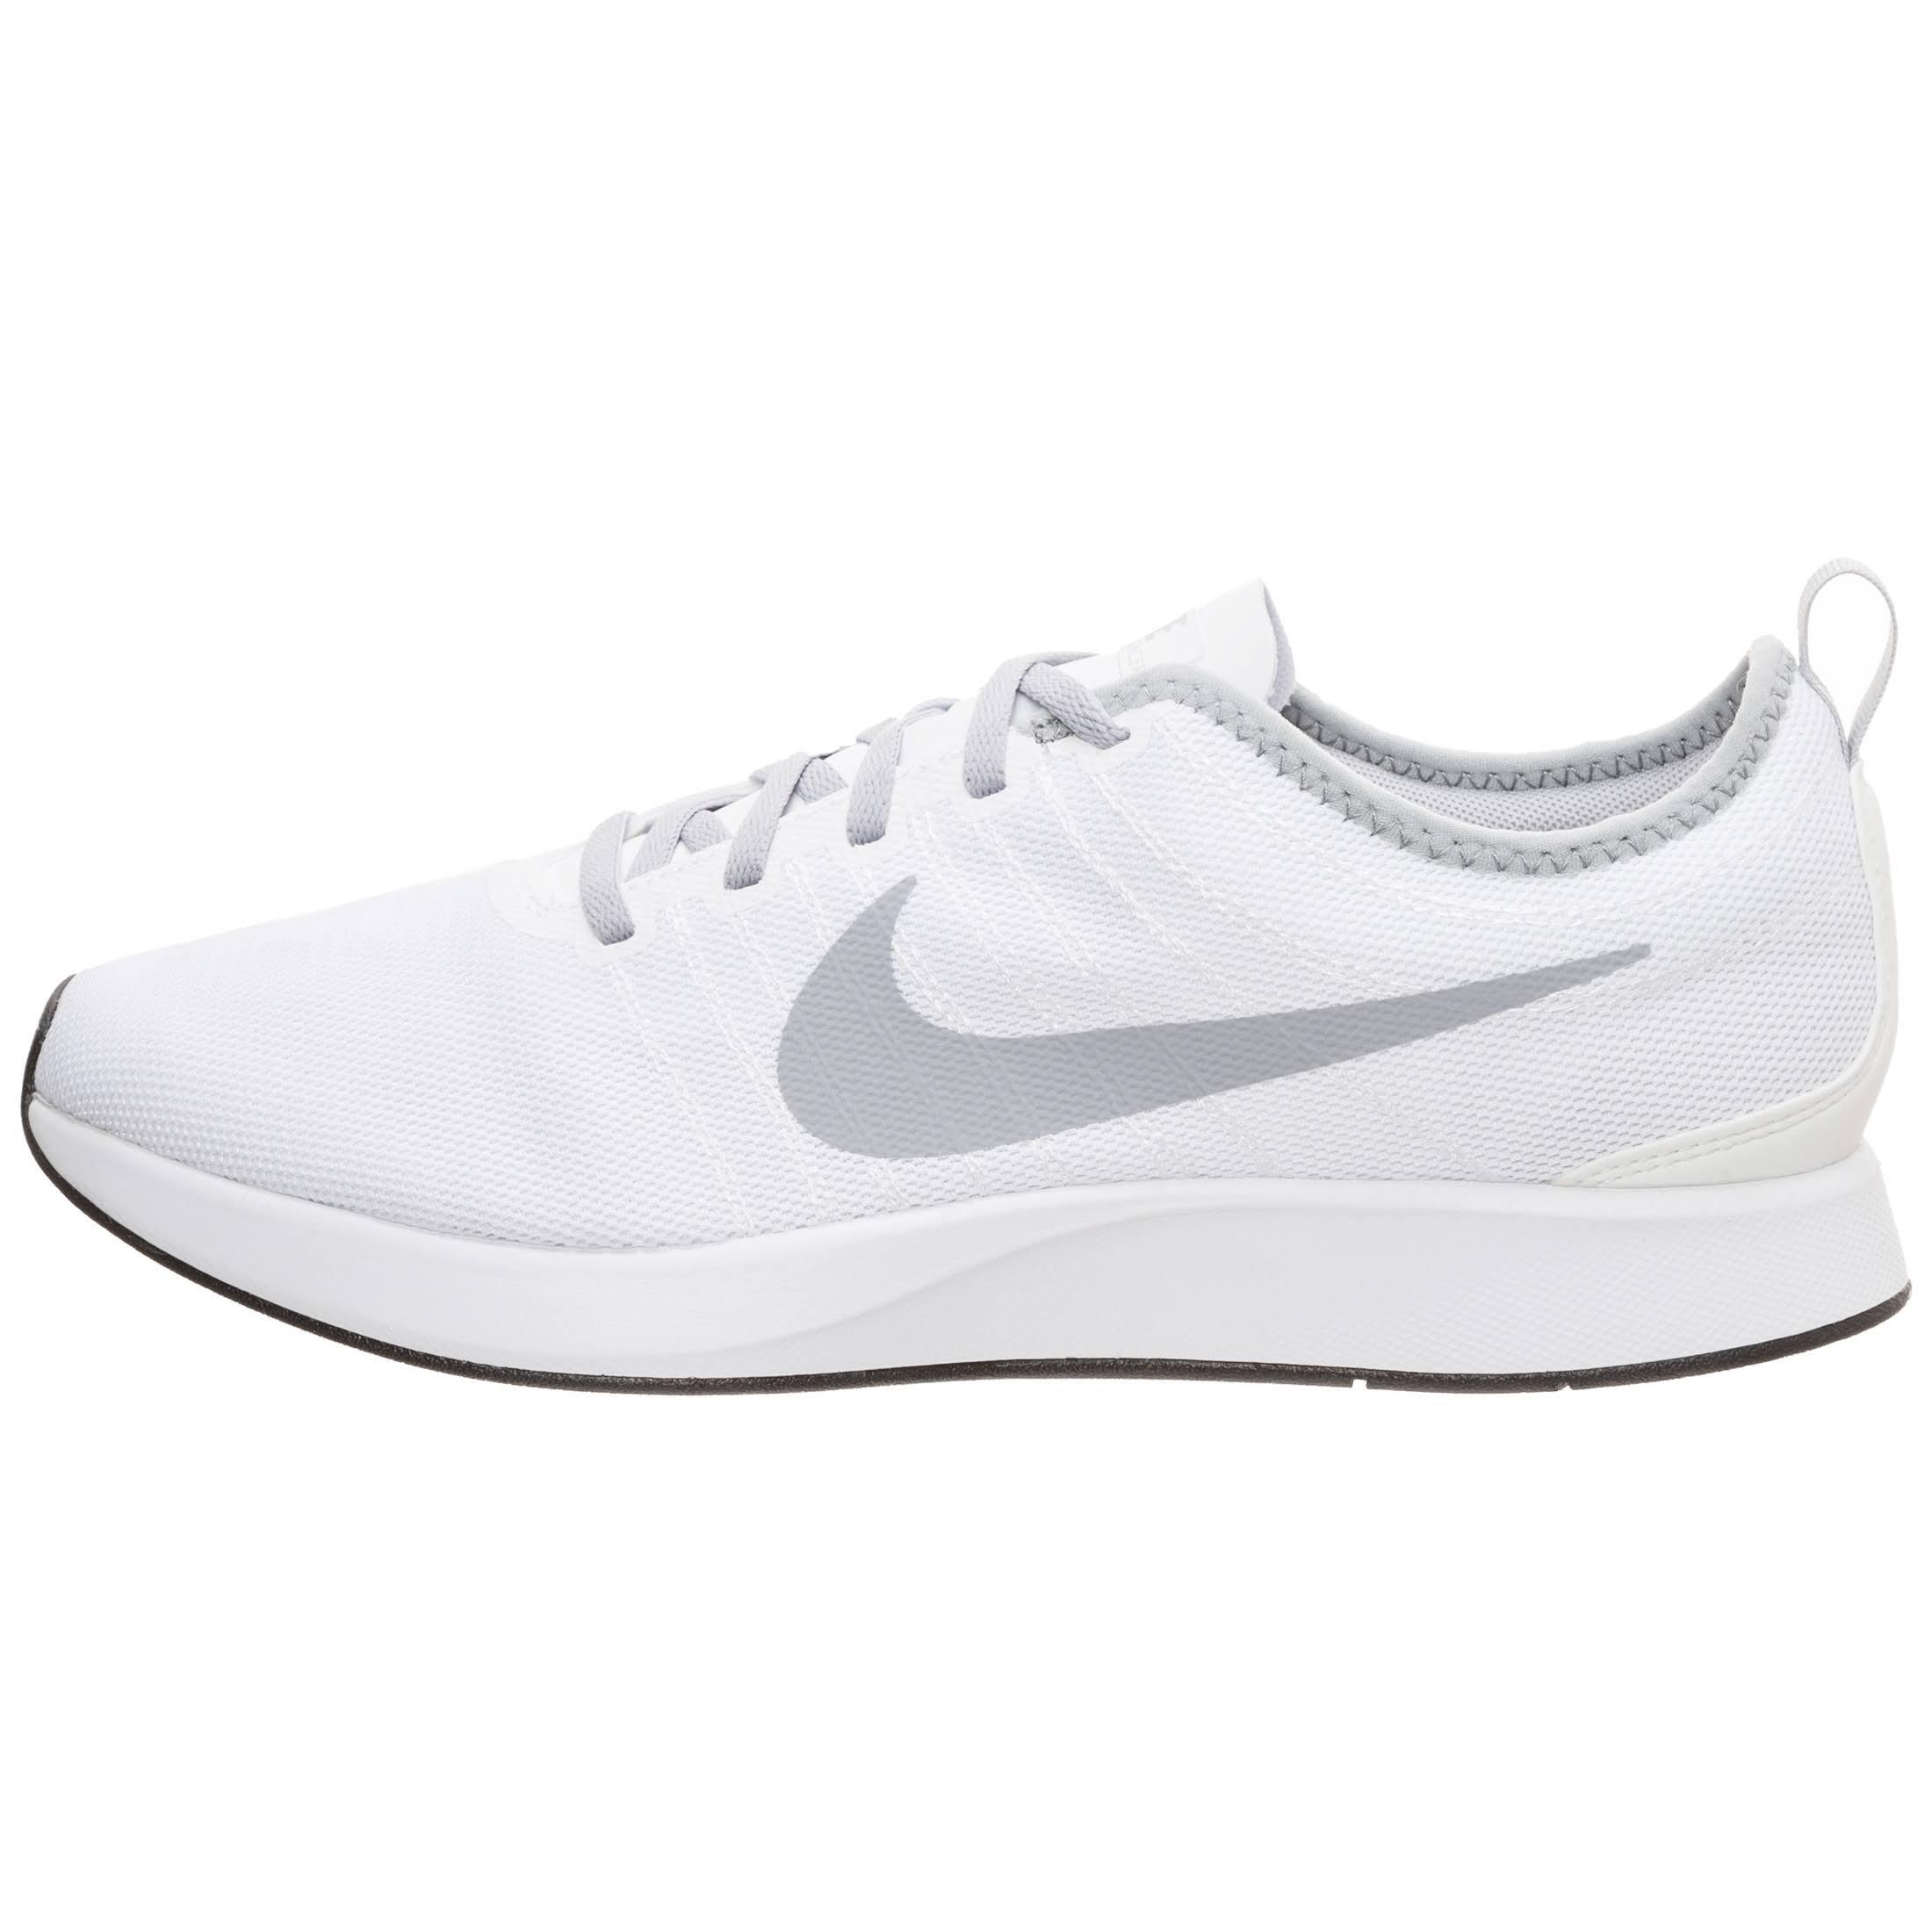 Weiß weiß In Grau 5 Sneaker Herren Nike Racer Grösse Dualtone 42 nUvXFnqw6x